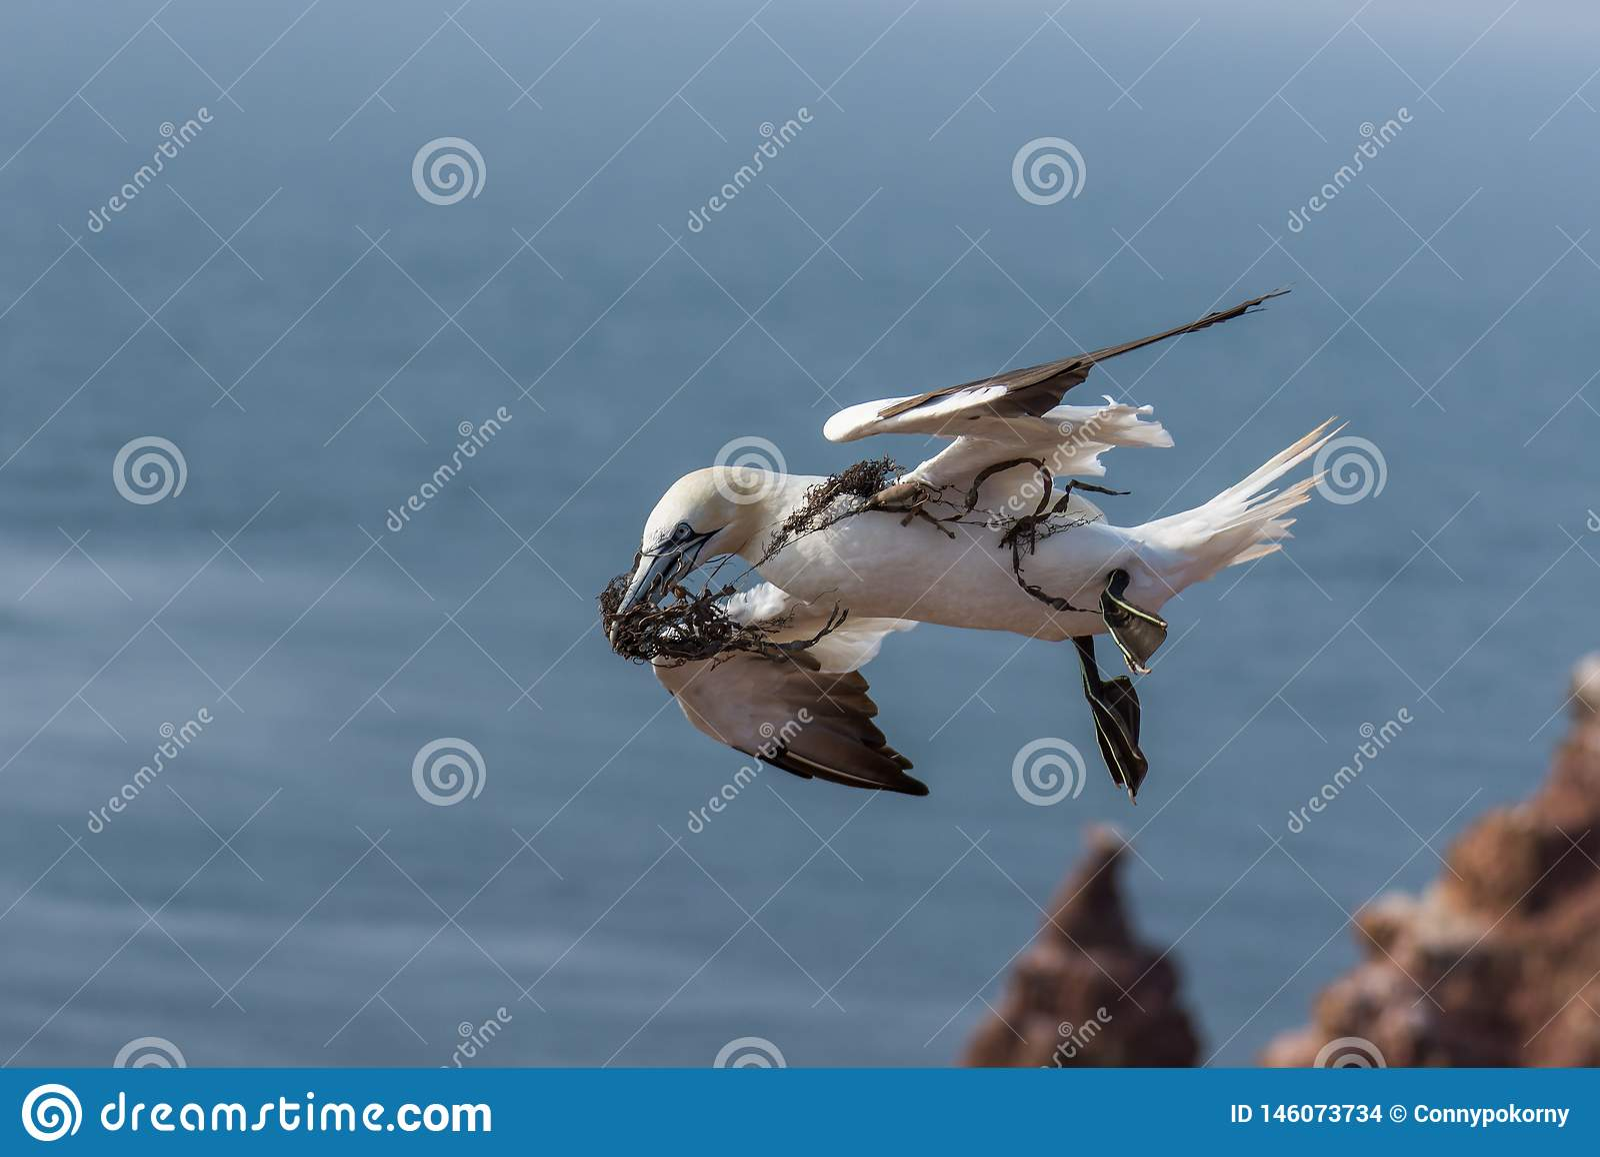 Flying Northern Gannett, Helgoland, Germany